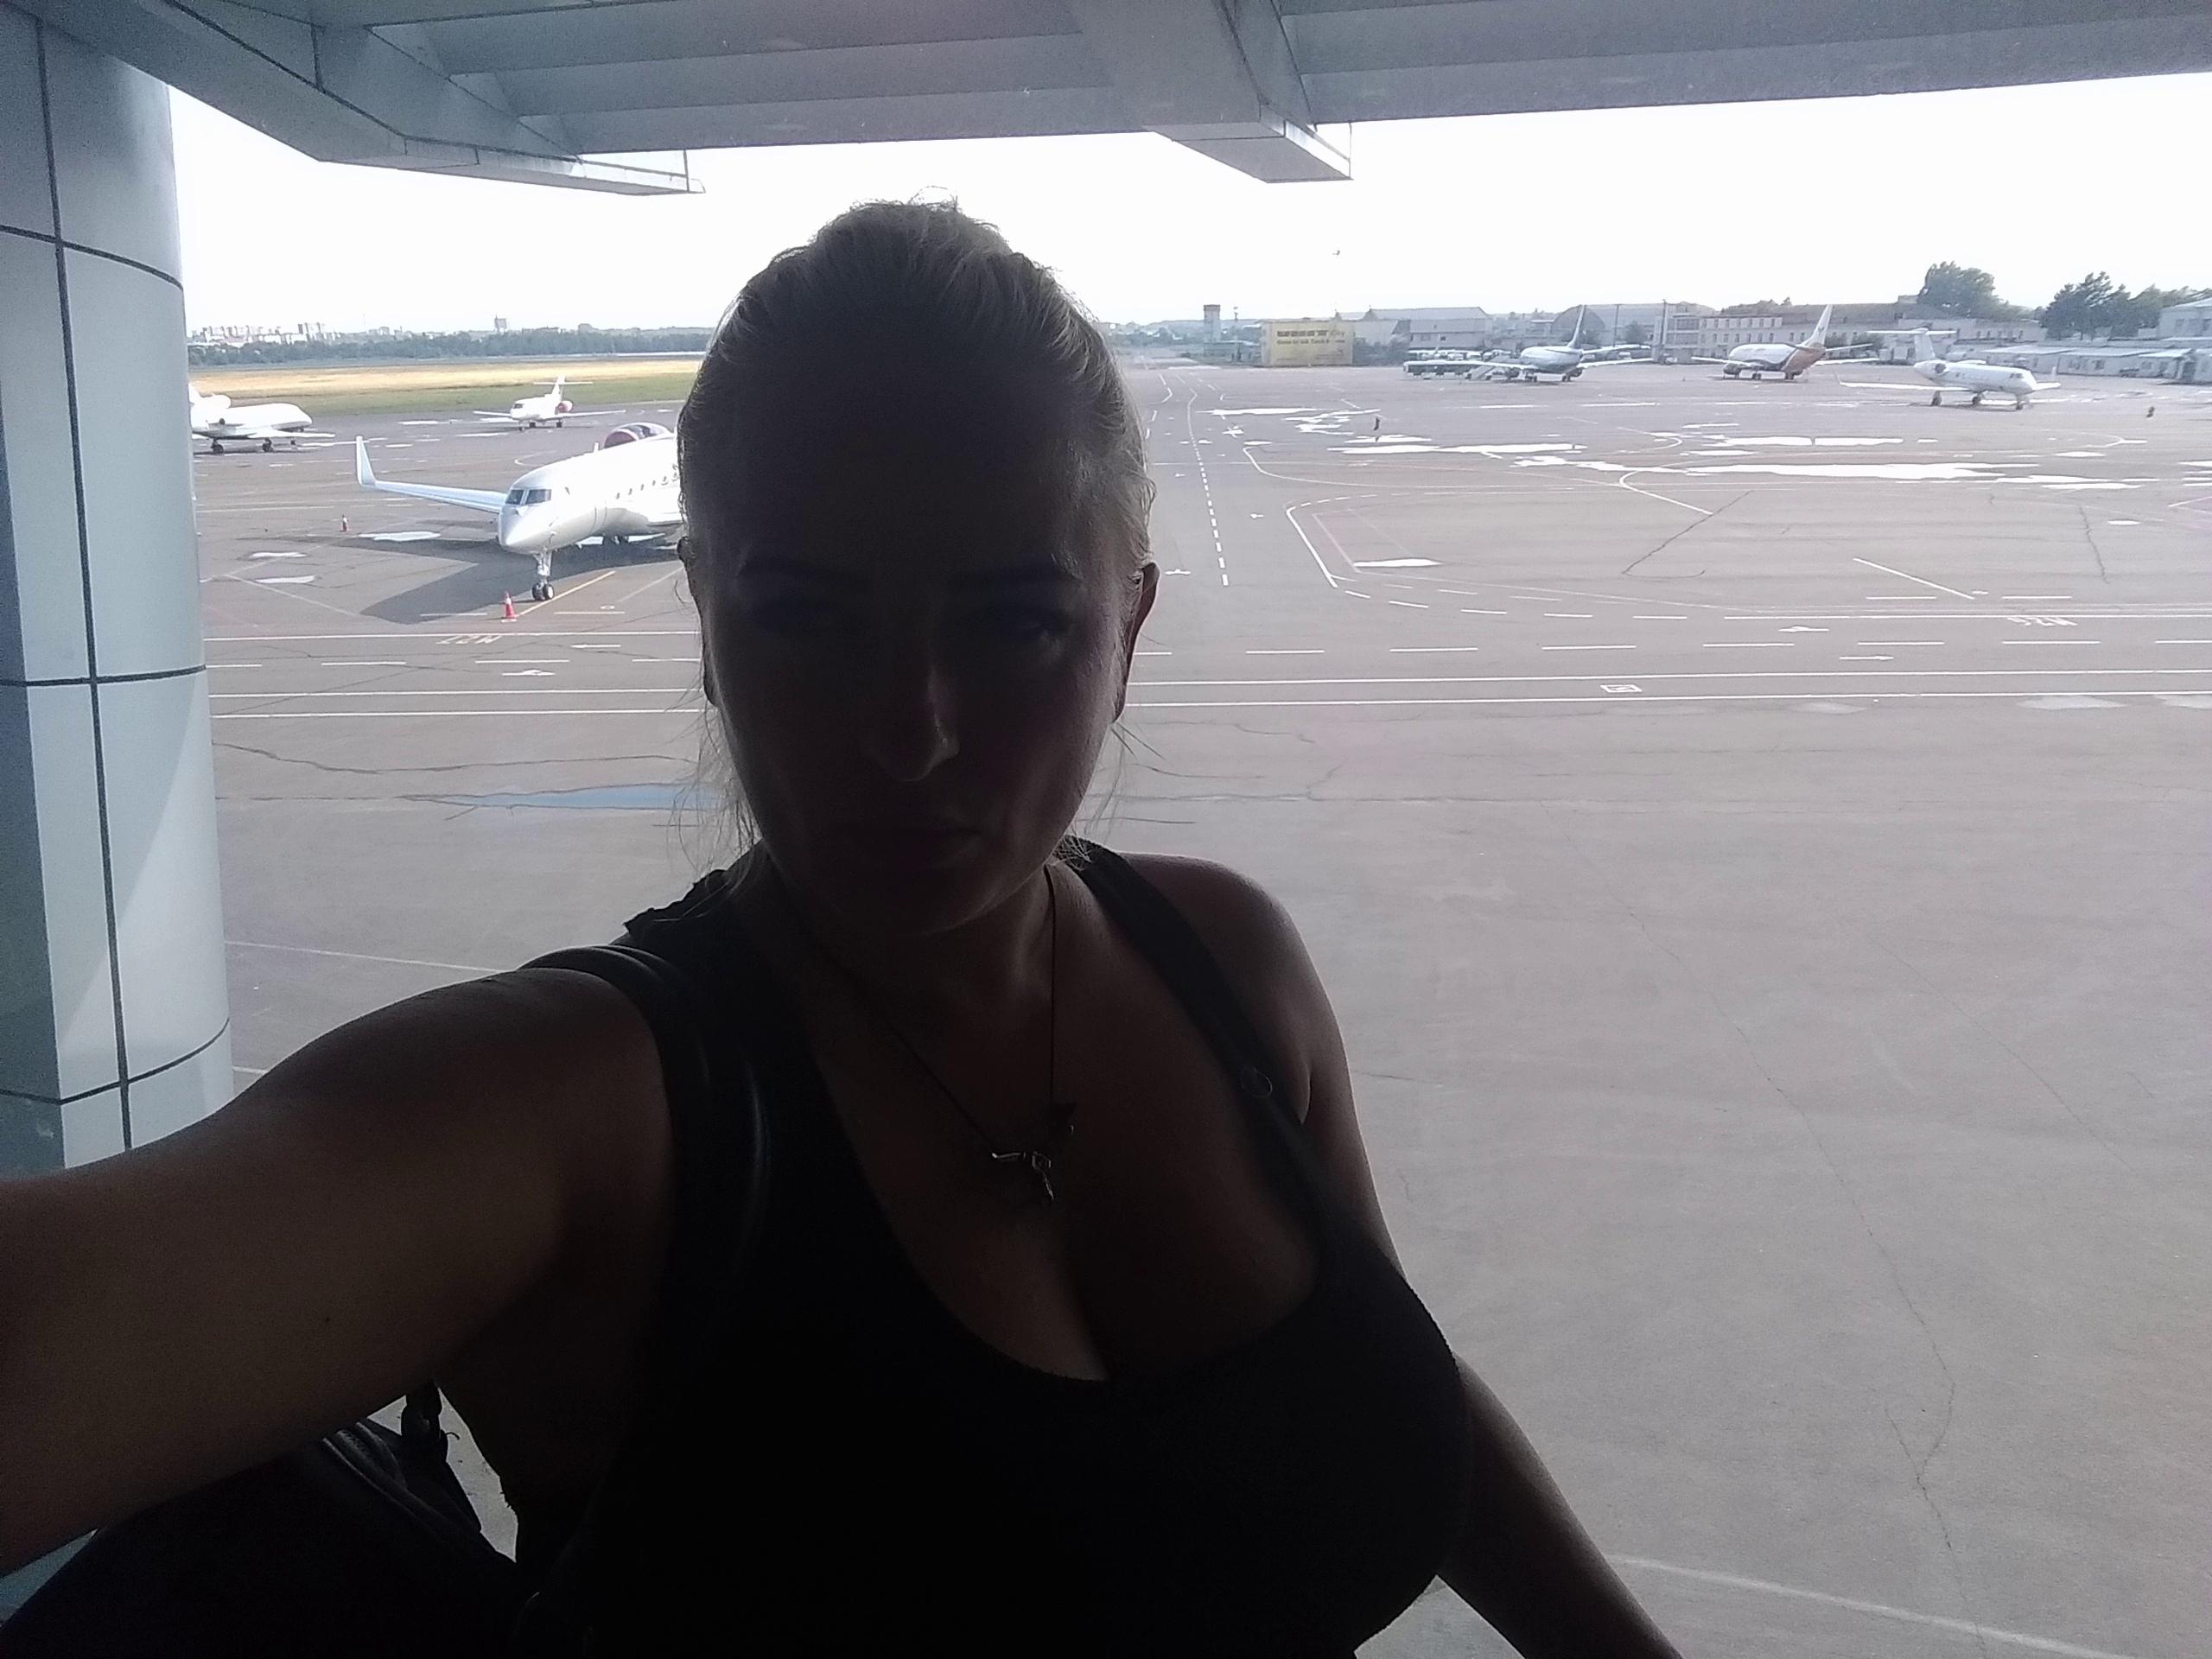 Елена Руденко (Валтея). Украина. Киев. Фото и описание.  JXAnmughIiY